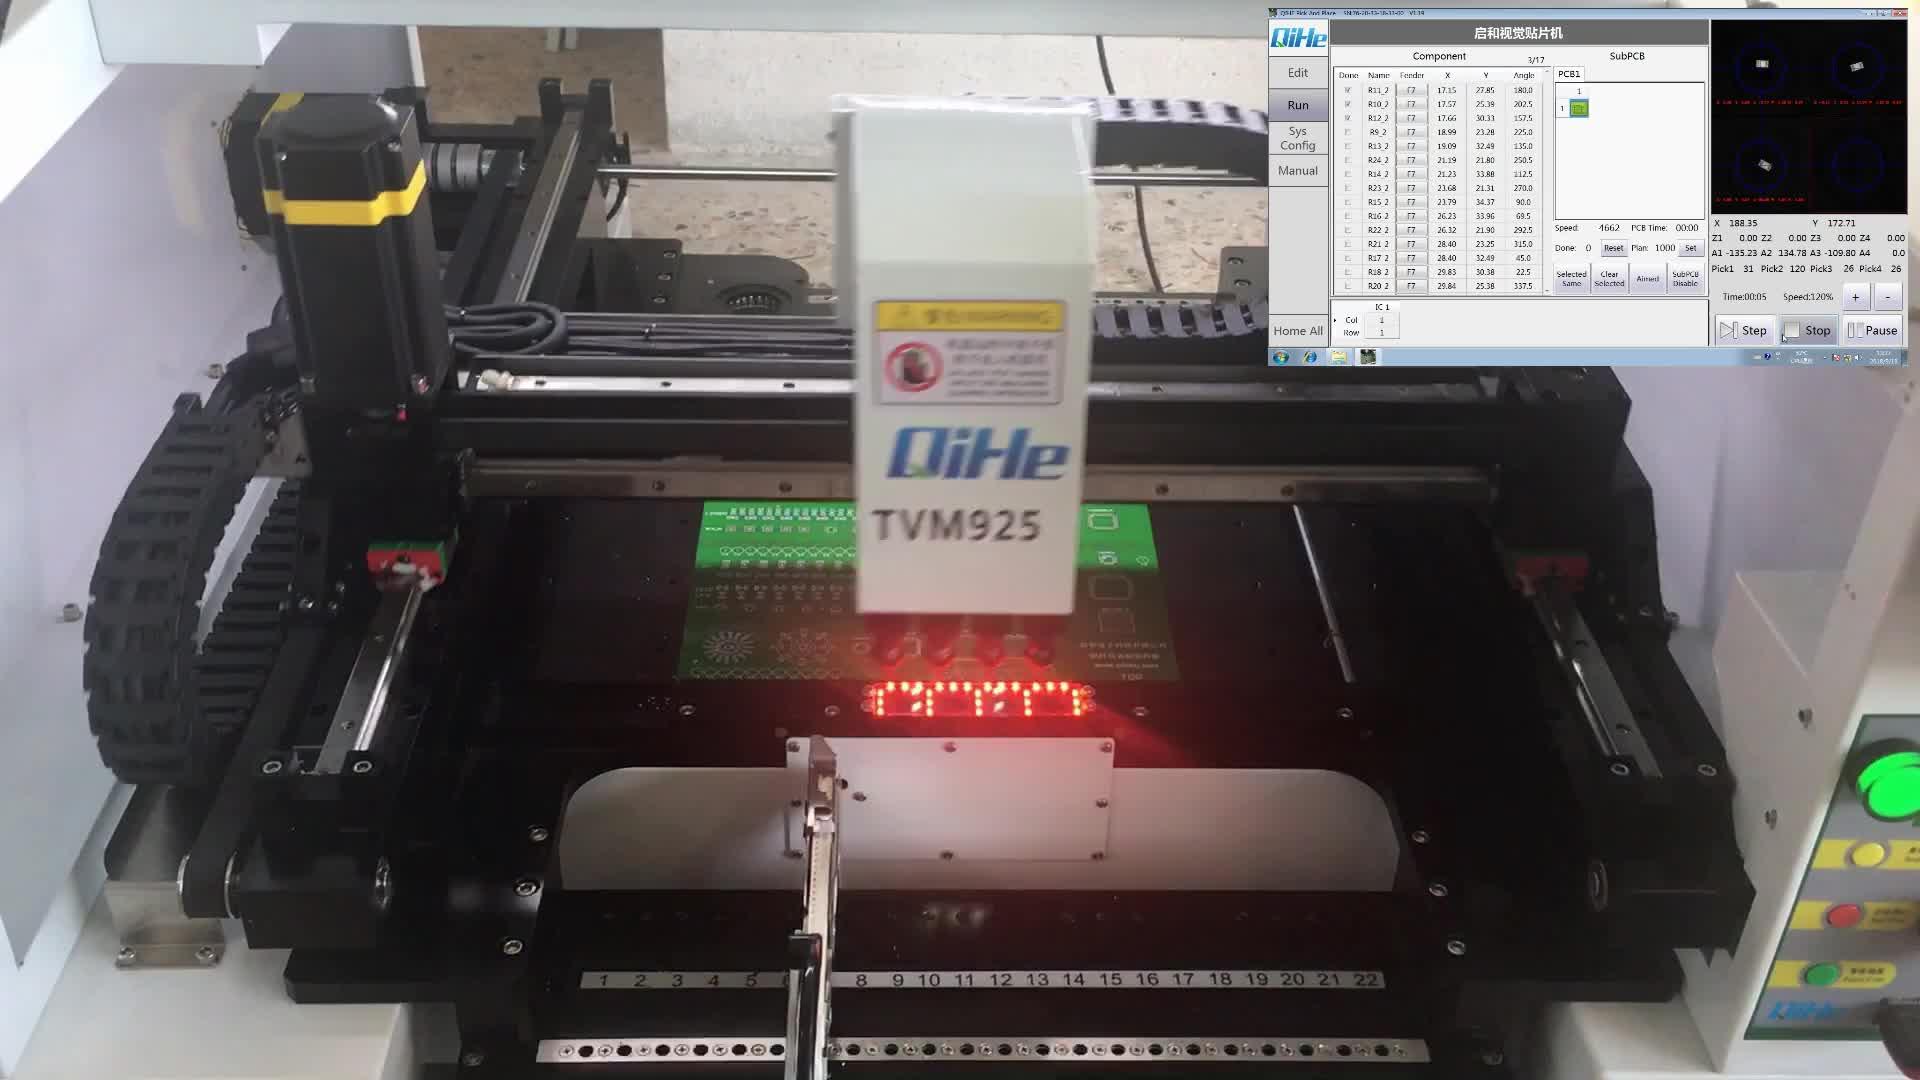 Factory direct supply PCB montage machines QIHE TVM925 SMT SMD pick en place machine met 6 camera's